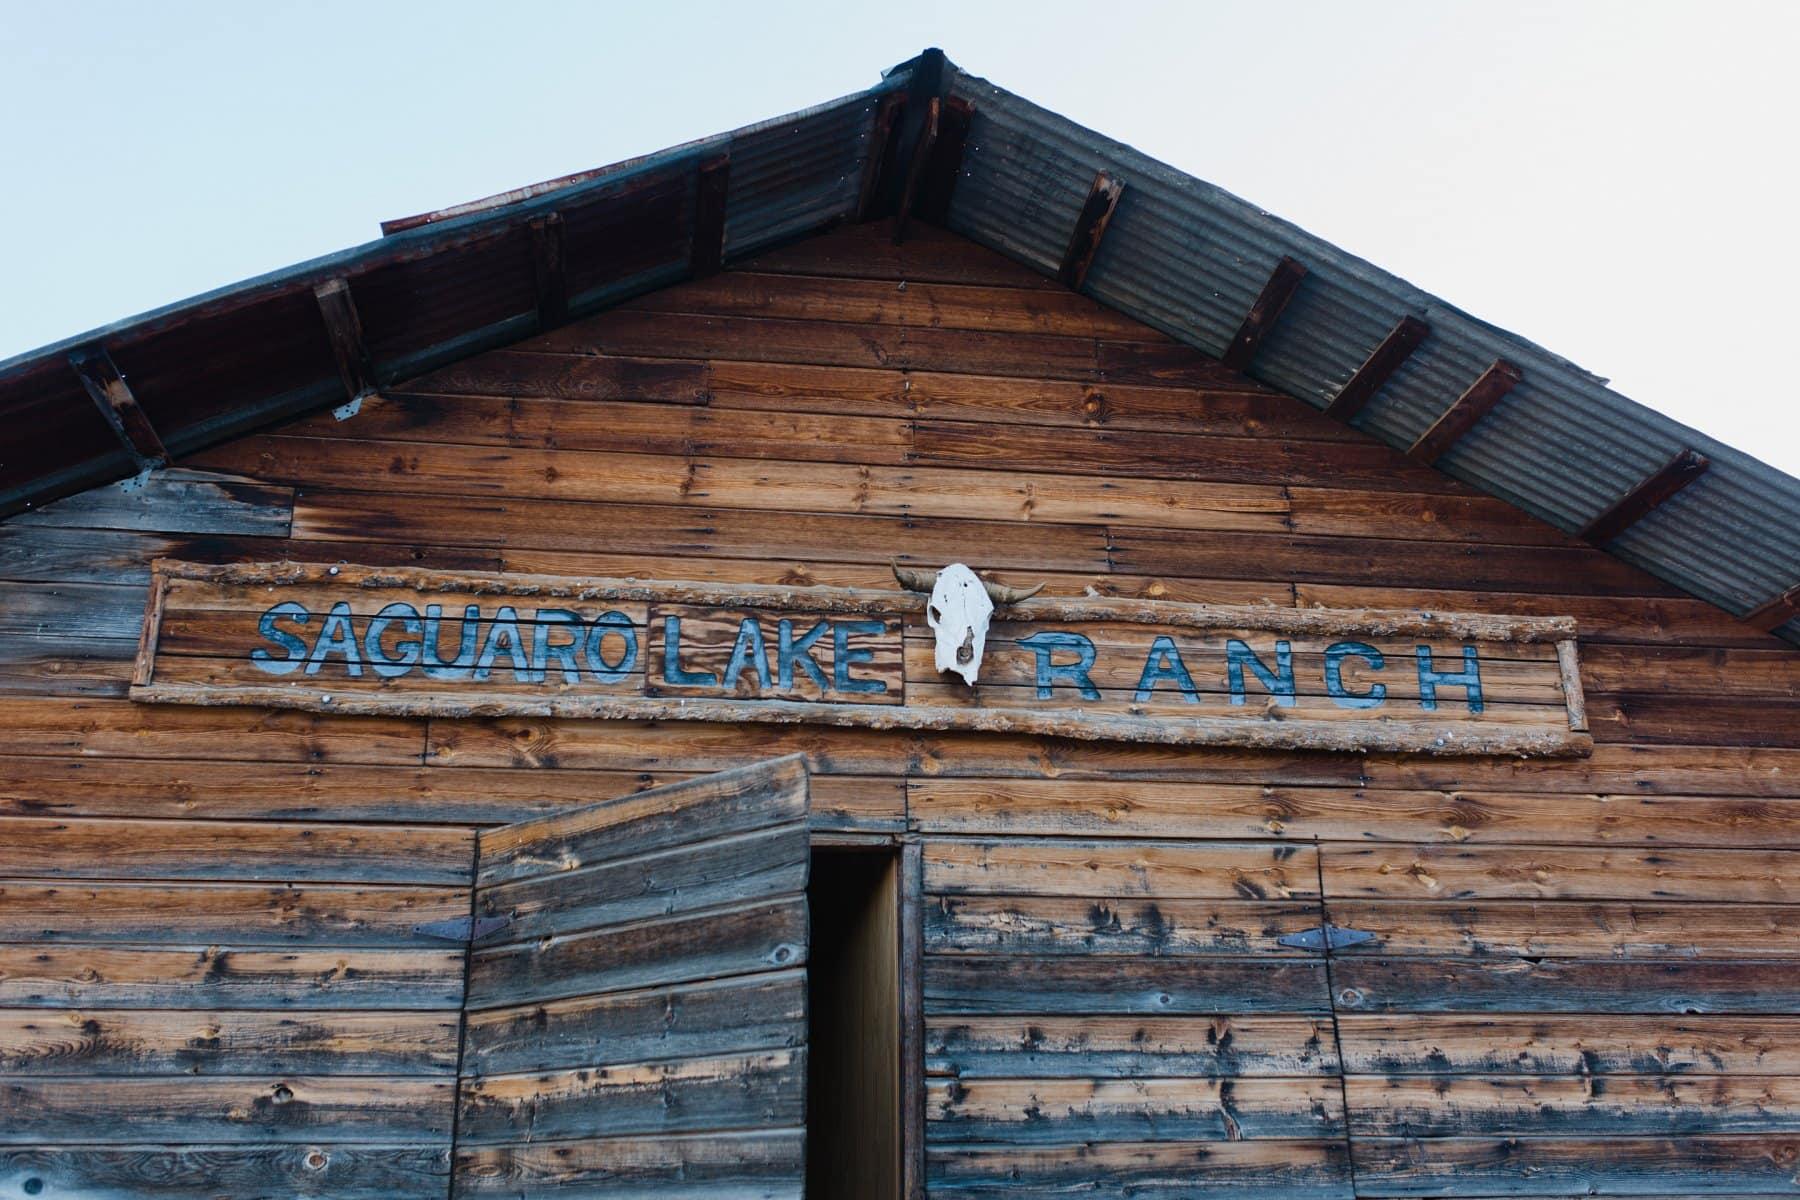 Saguaro Lake Ranch barn